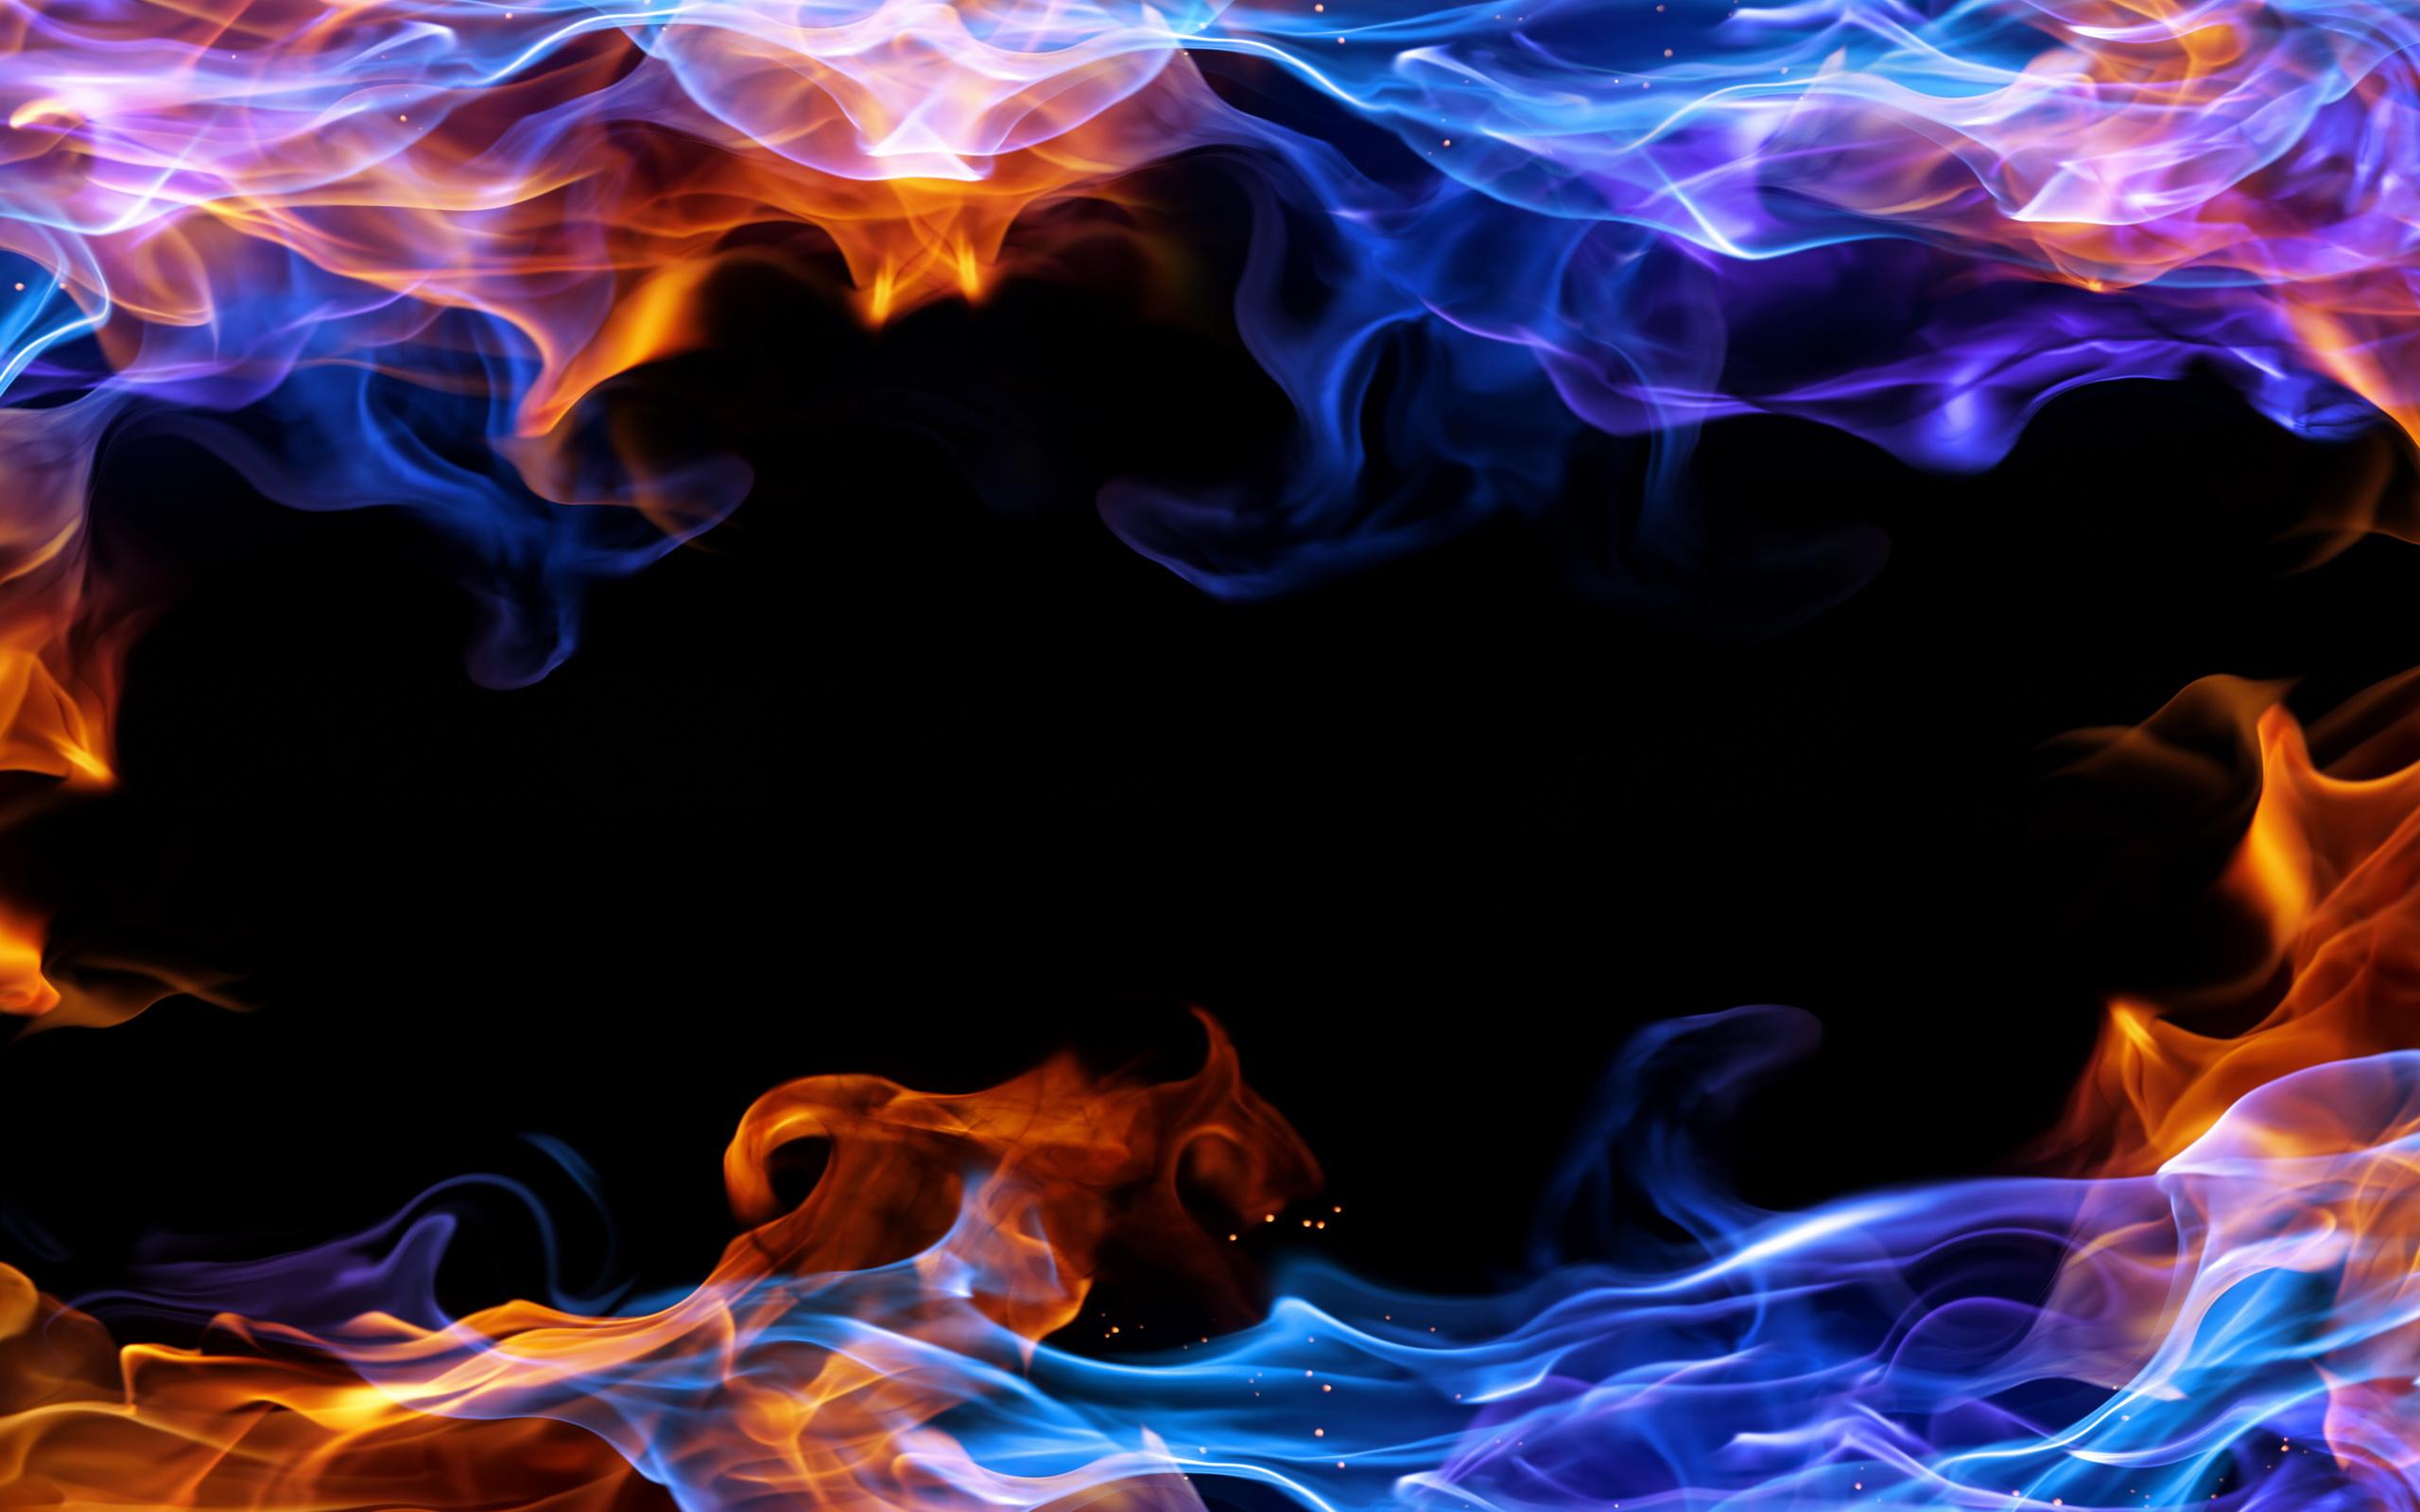 Fire Wallpaper Pc: Fire HD Wallpaper